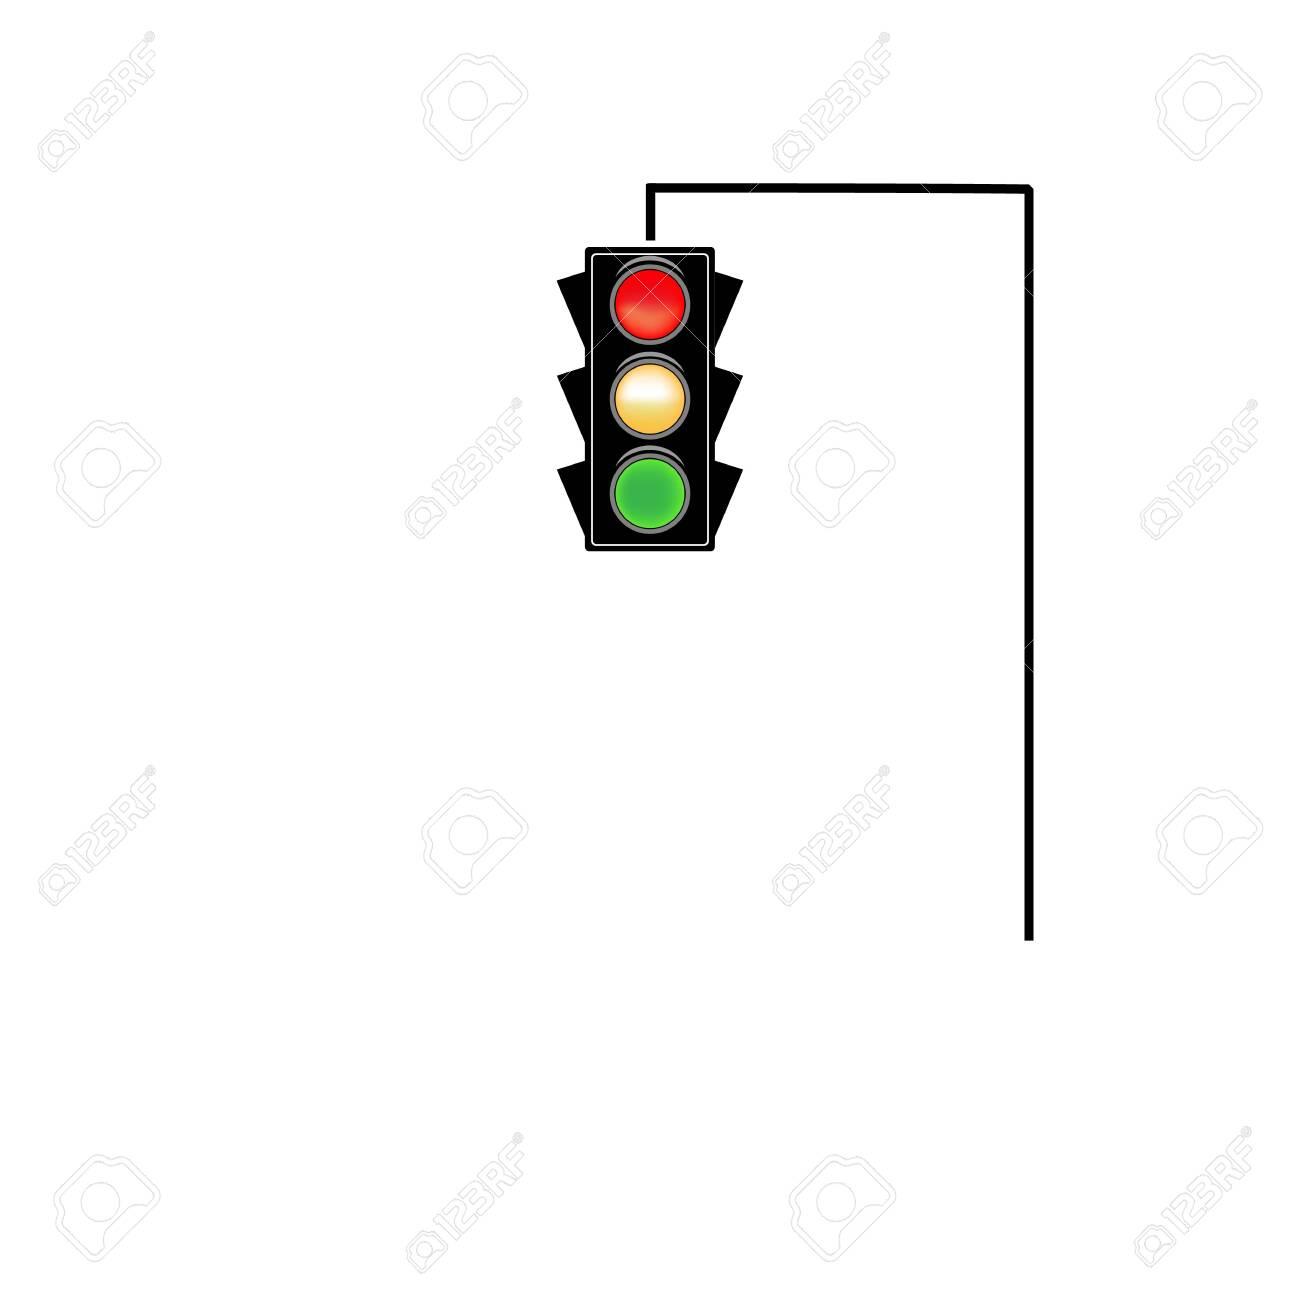 Stoplight sign. Icon traffic light on white background. Symbol regulate movement safety and warning. Electricity semaphore regulate transportation on crossroads urban road. Flat vector illustration - 149911906